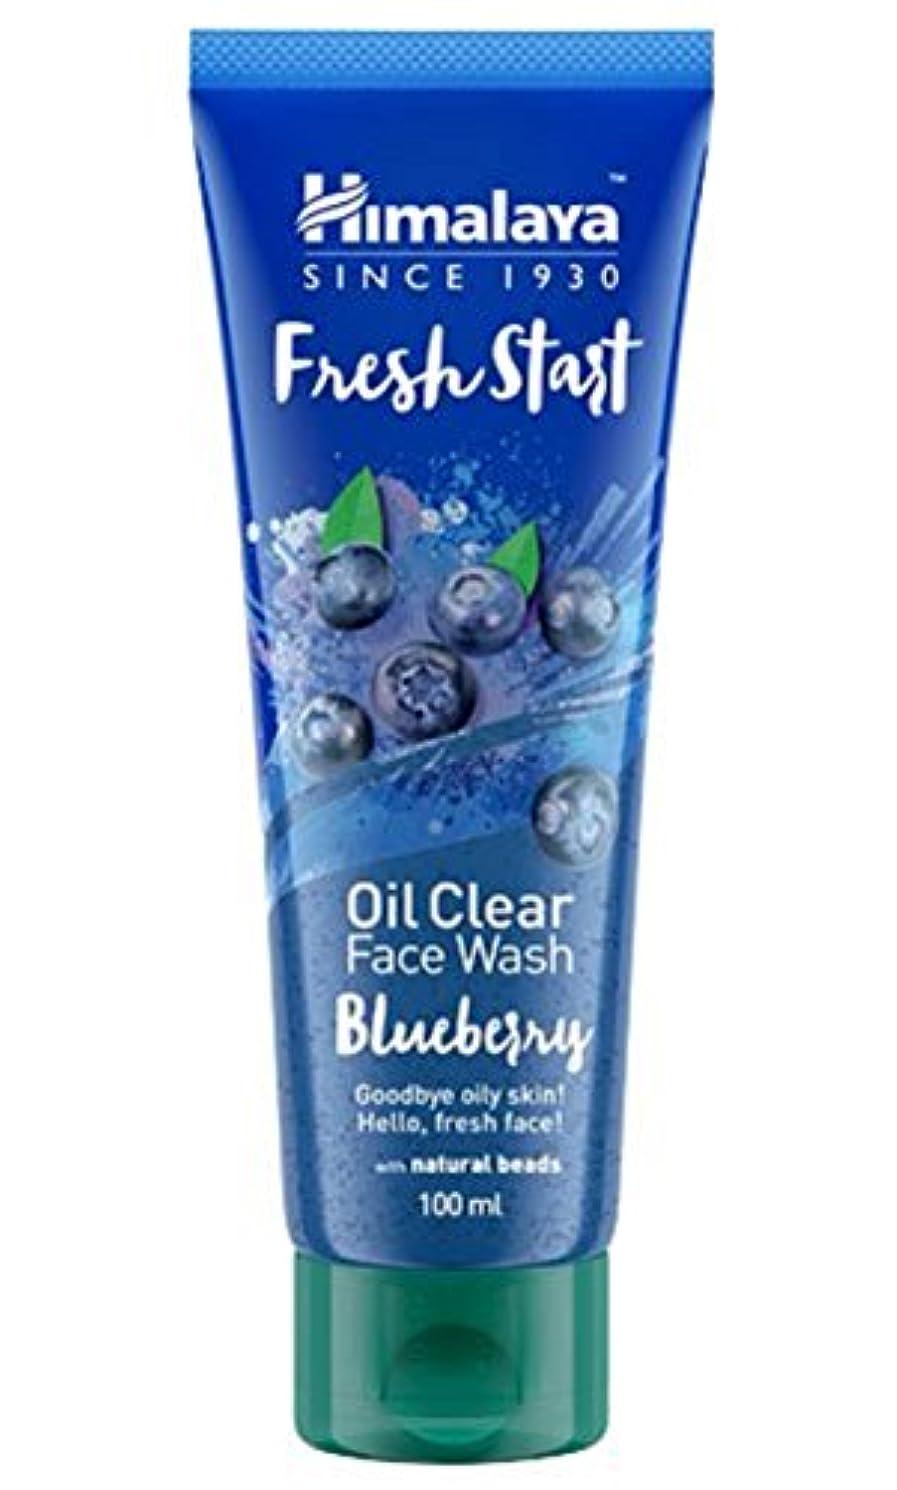 日記弾薬大胆不敵Himalaya Fresh Start Oil Clear Face Wash, Blueberry, 100ml